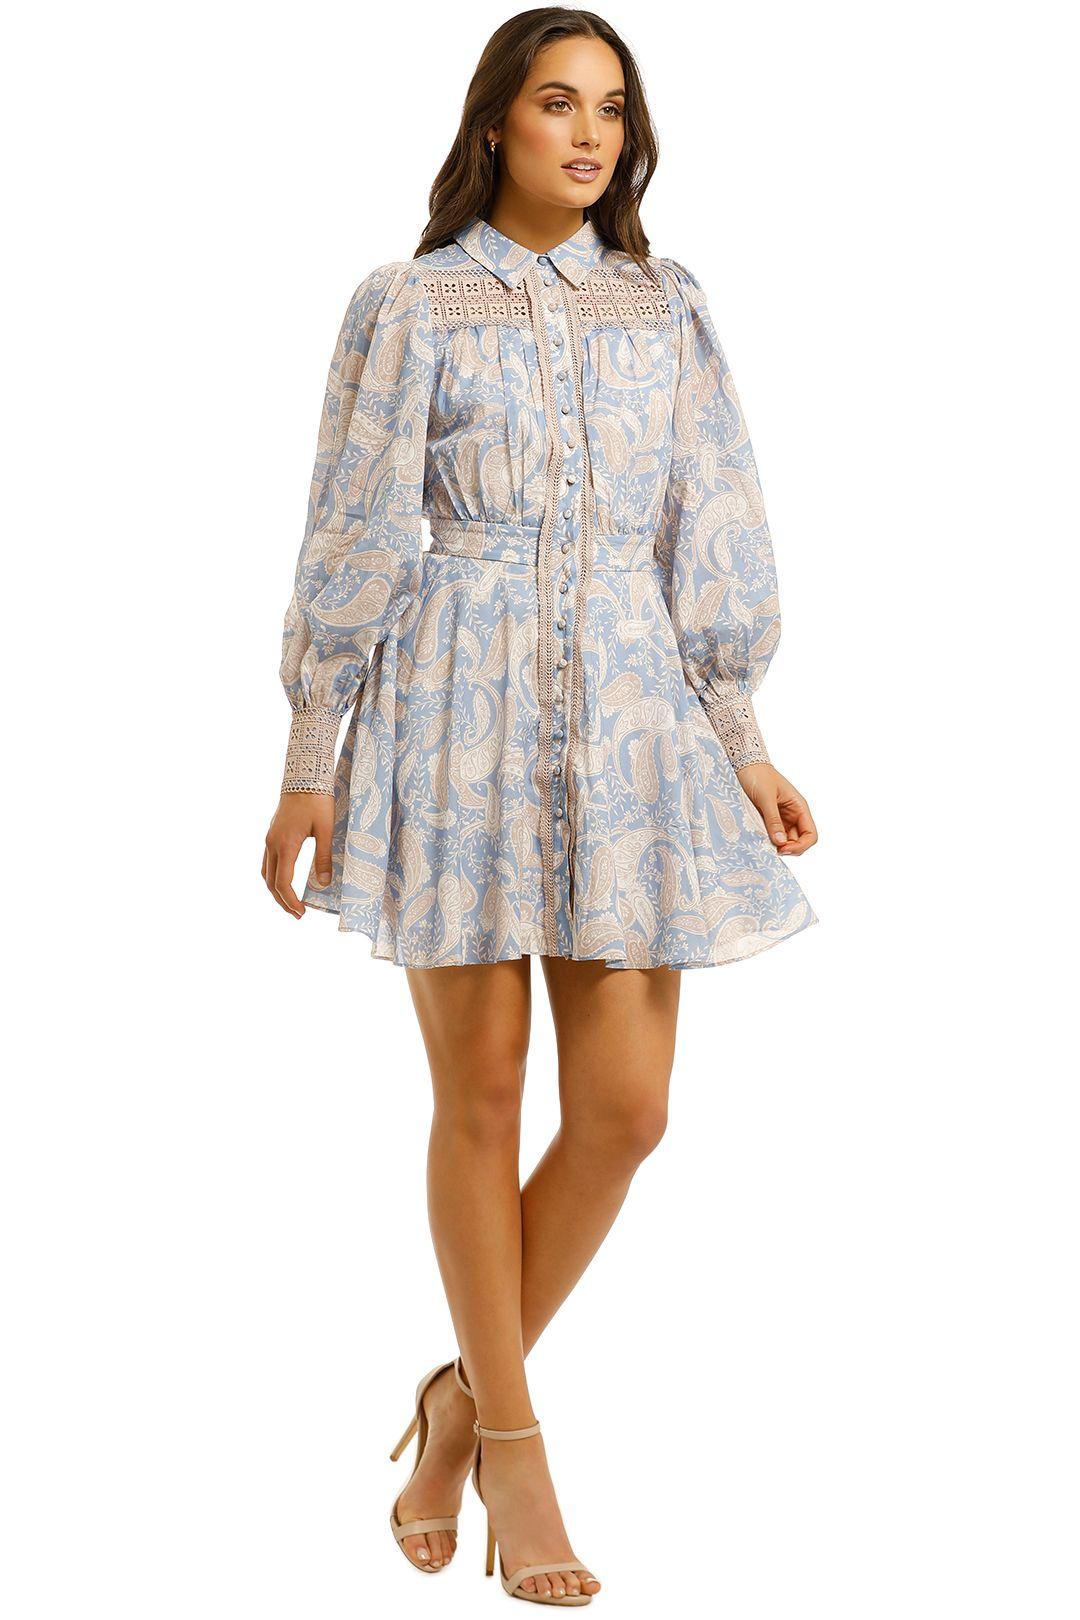 We-Are-Kindred-Sorrento-Mini-Dress-Cornflower-Paisley-Side